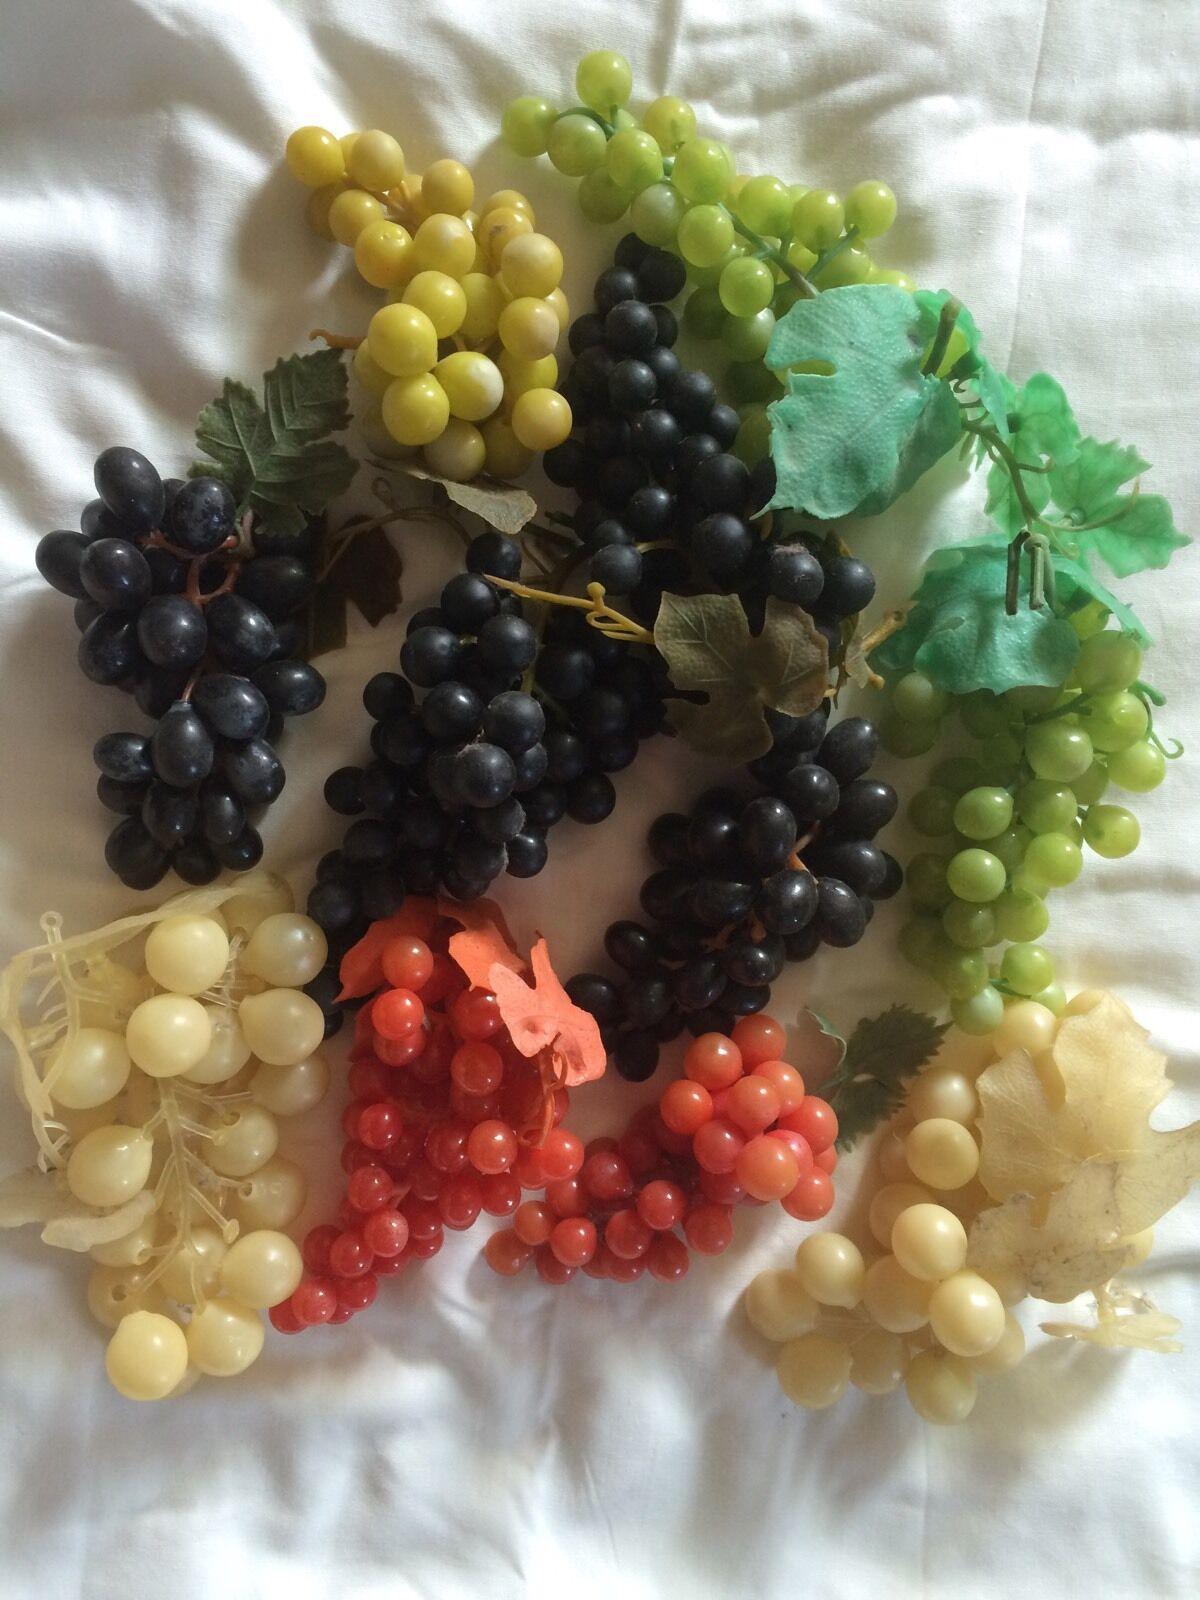 Lote enorme Artificial Decorativo falso Frutas 11 racimos de uva caucho plástico bx34